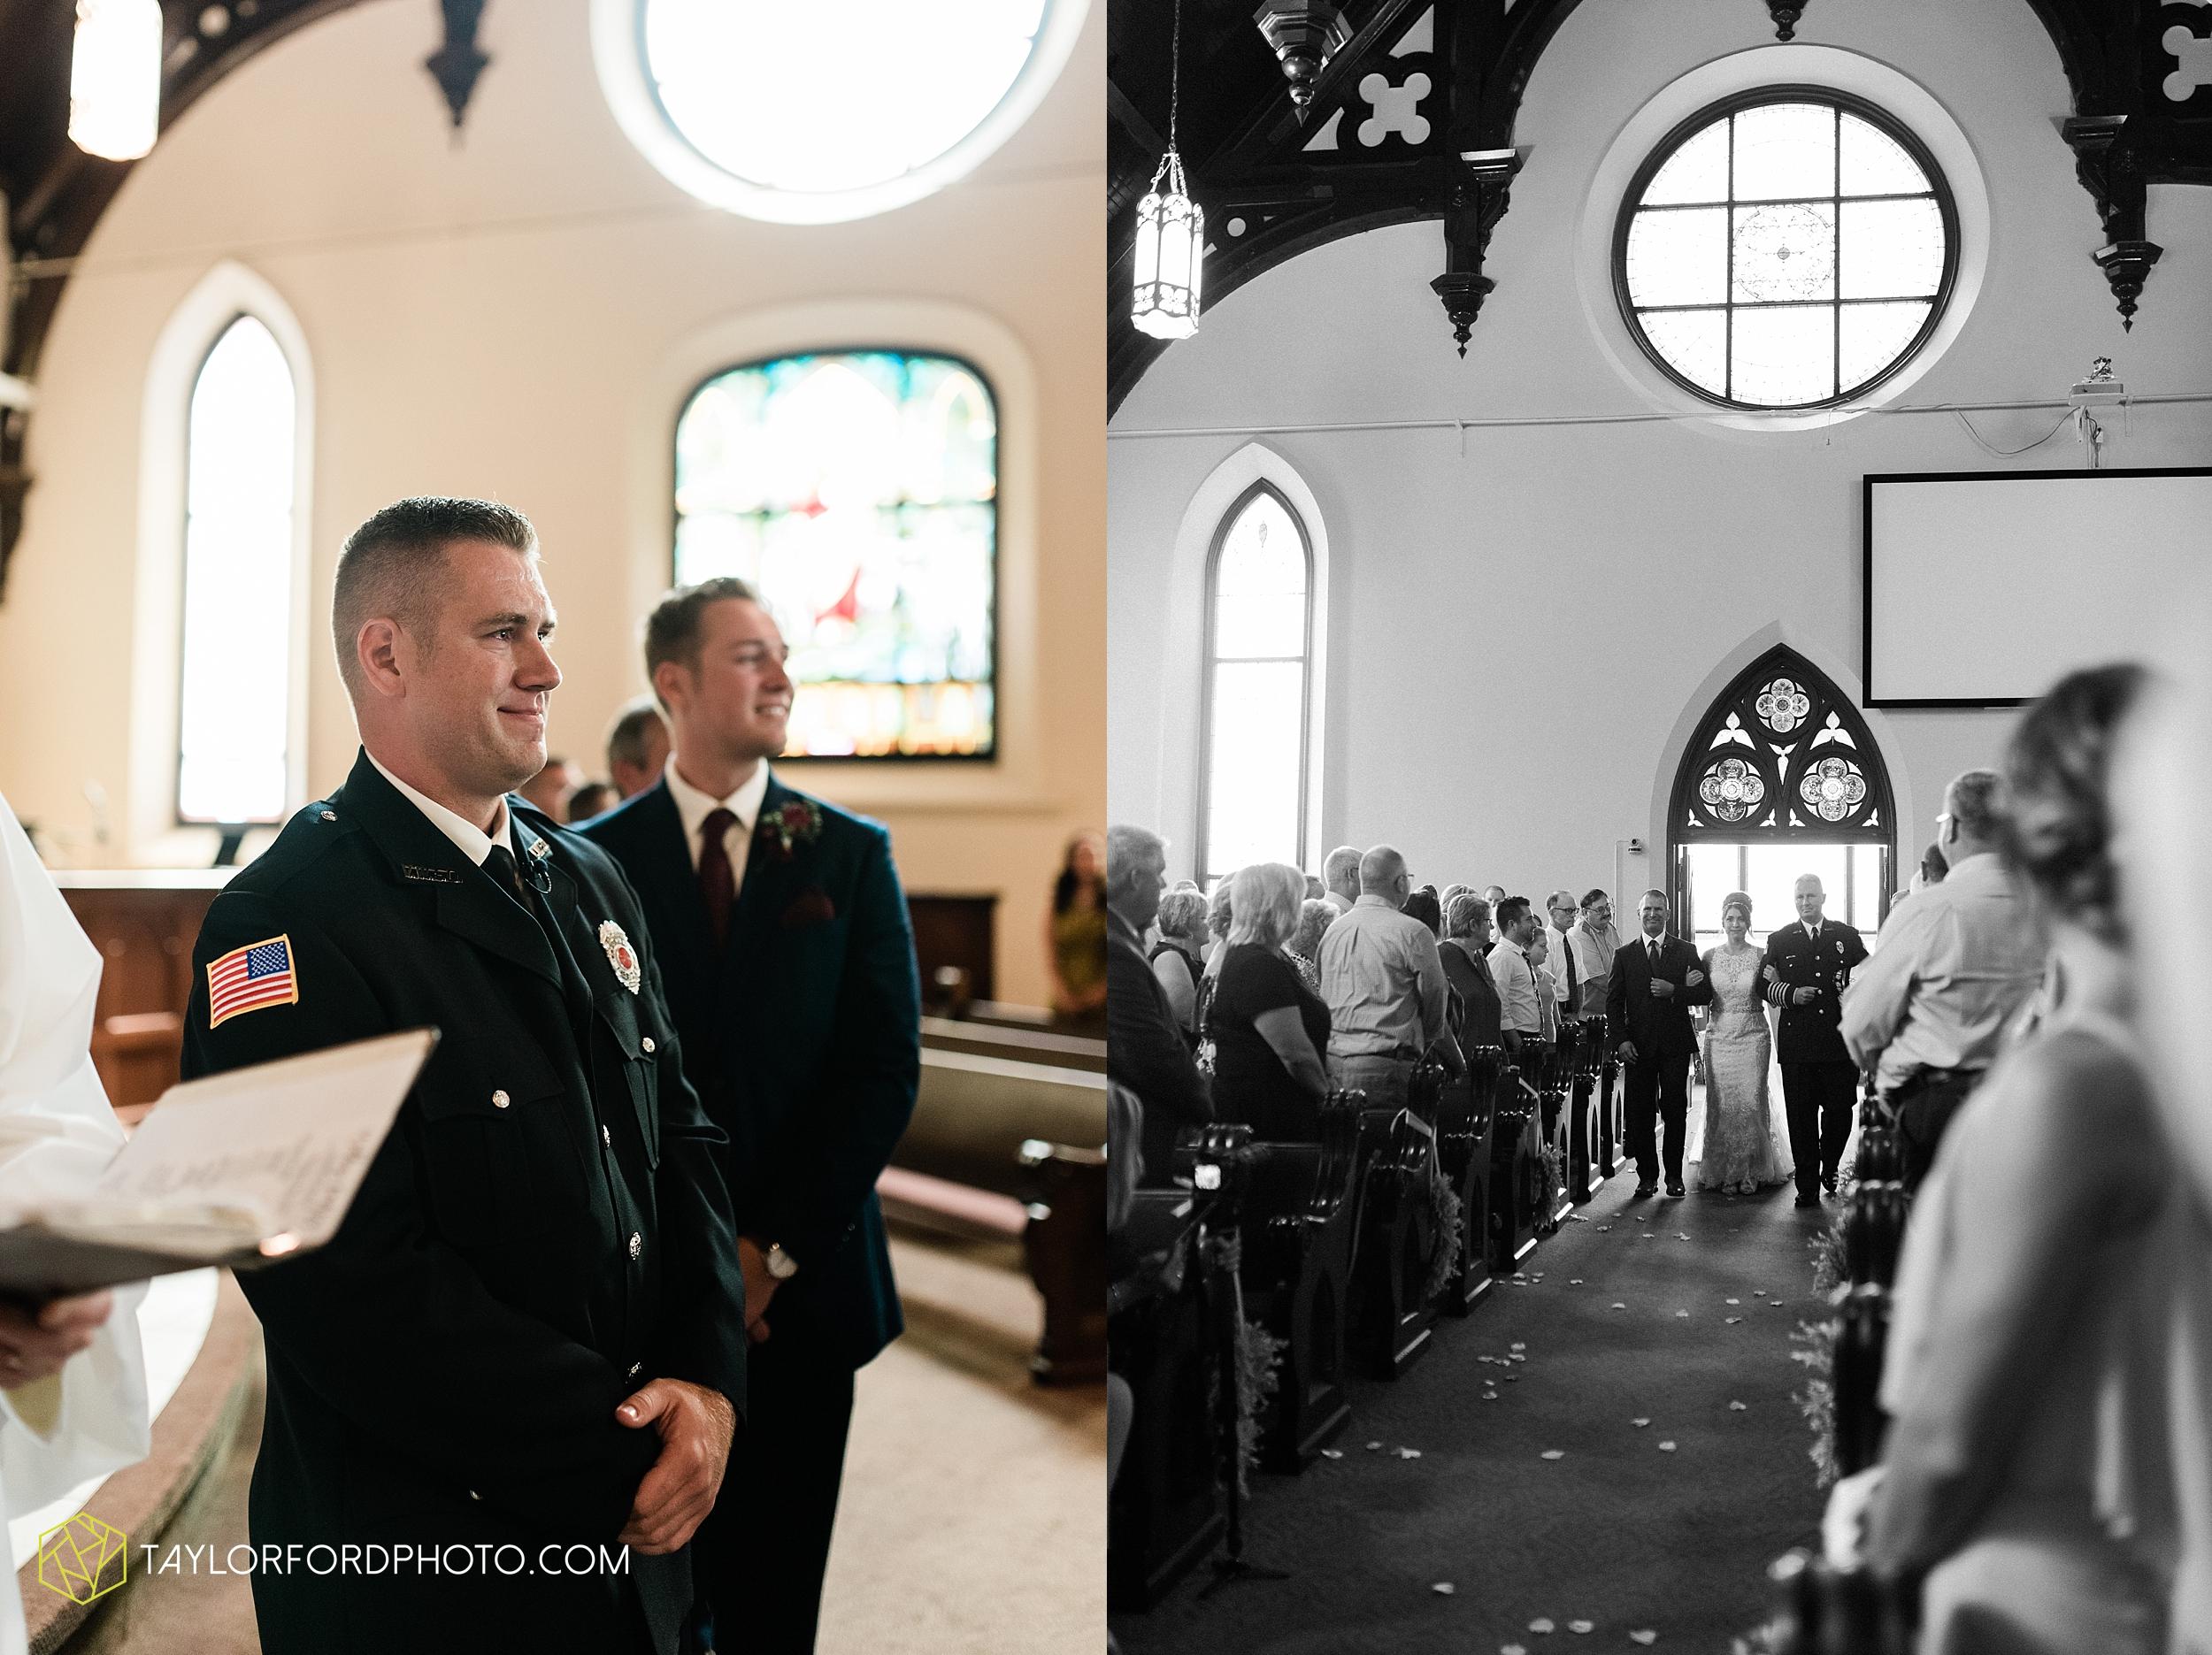 van-wert-ohio-first-united-methodist-church-county-dairy-barn-wedding-photographer-taylor-ford-photography_9828.jpg